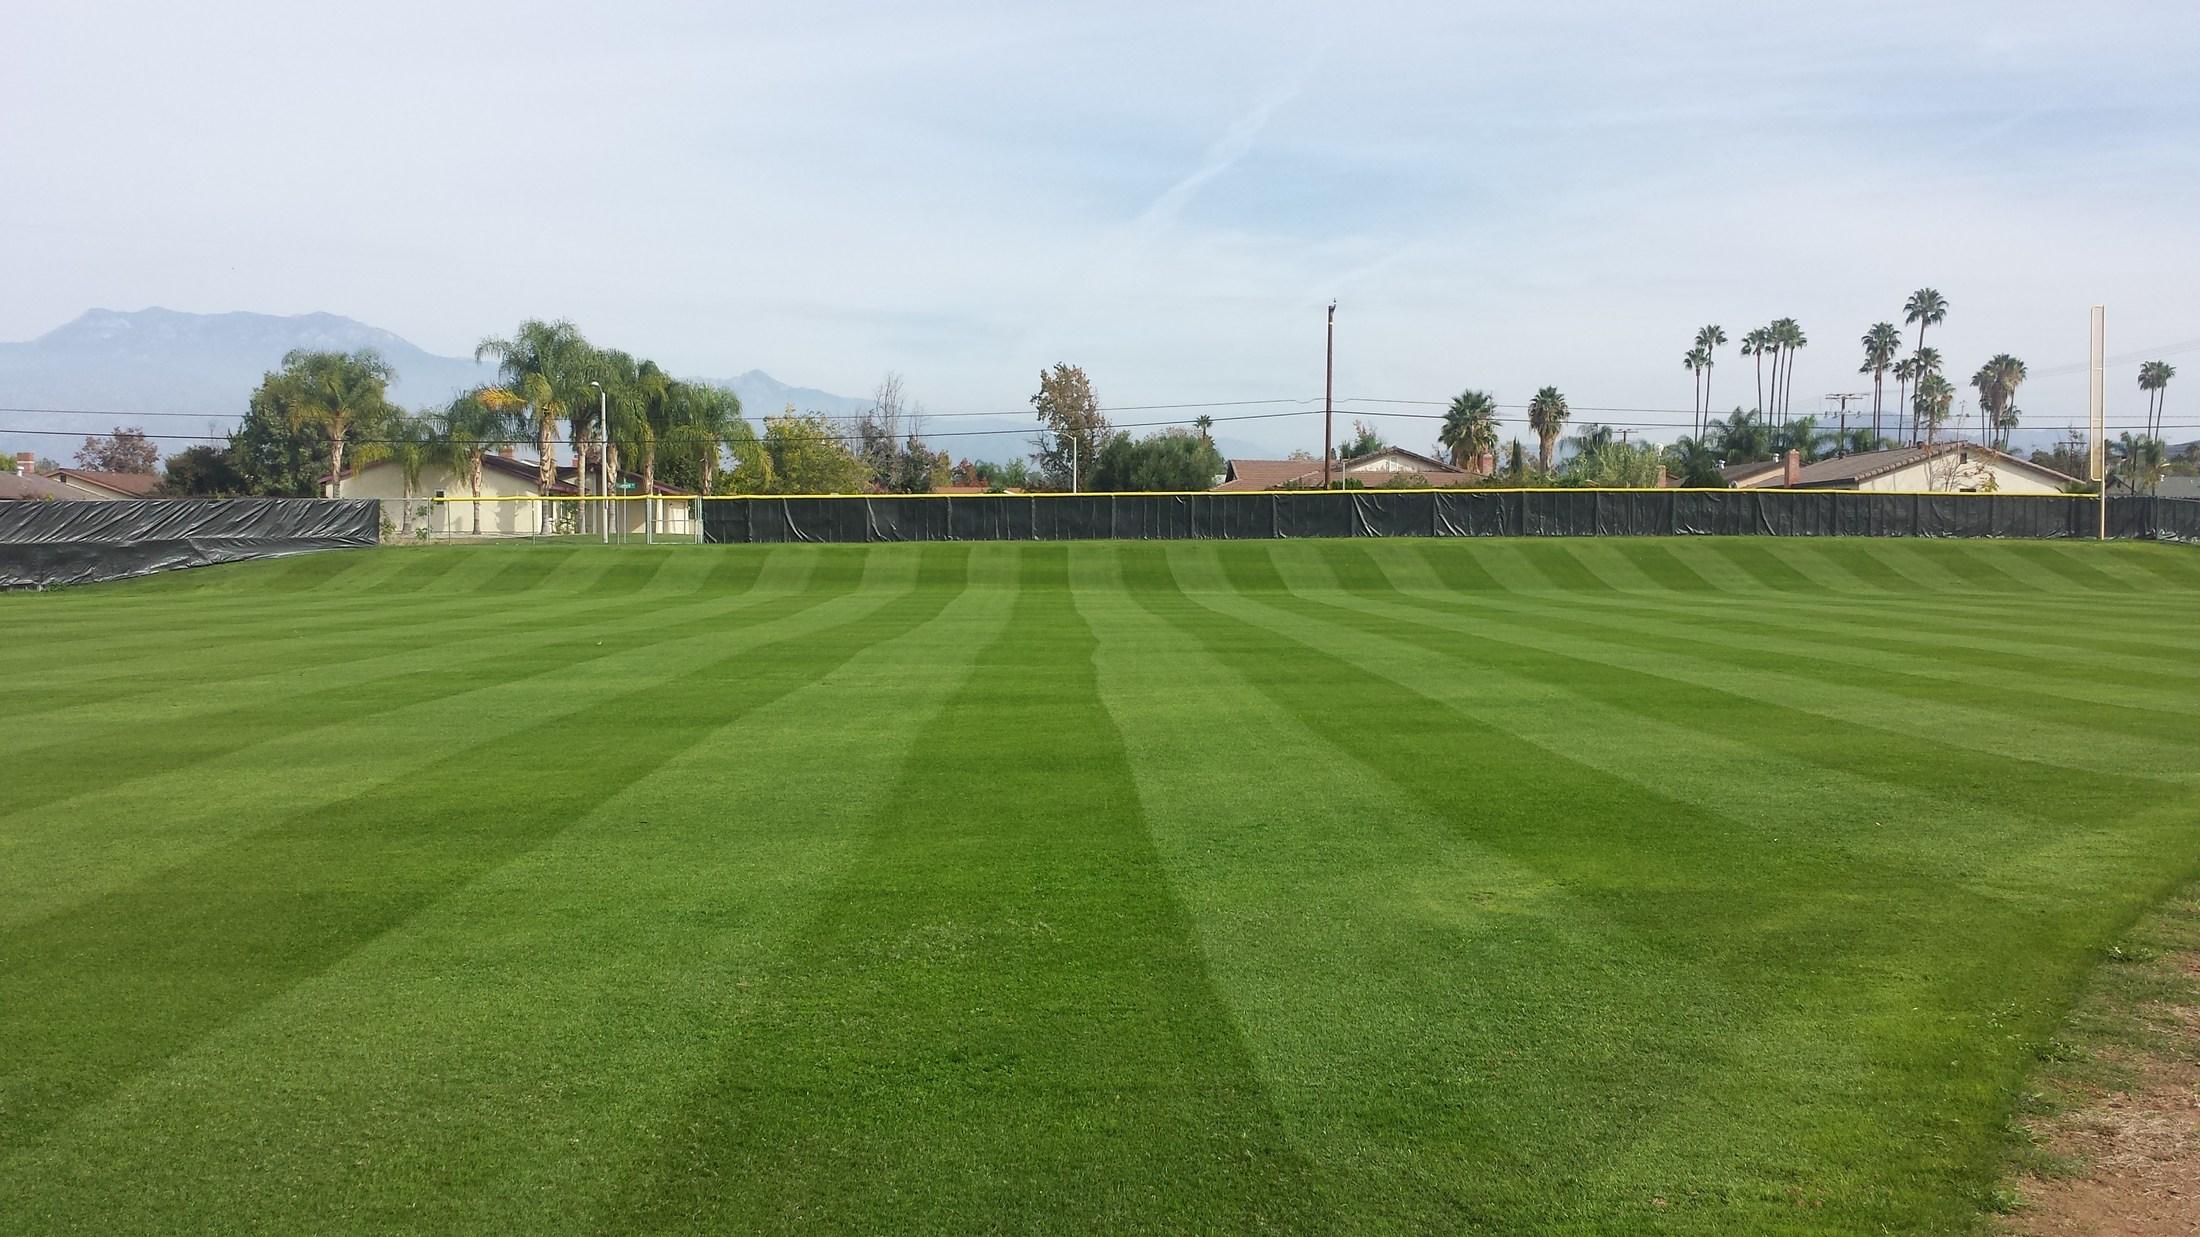 Tahquitz baseball field